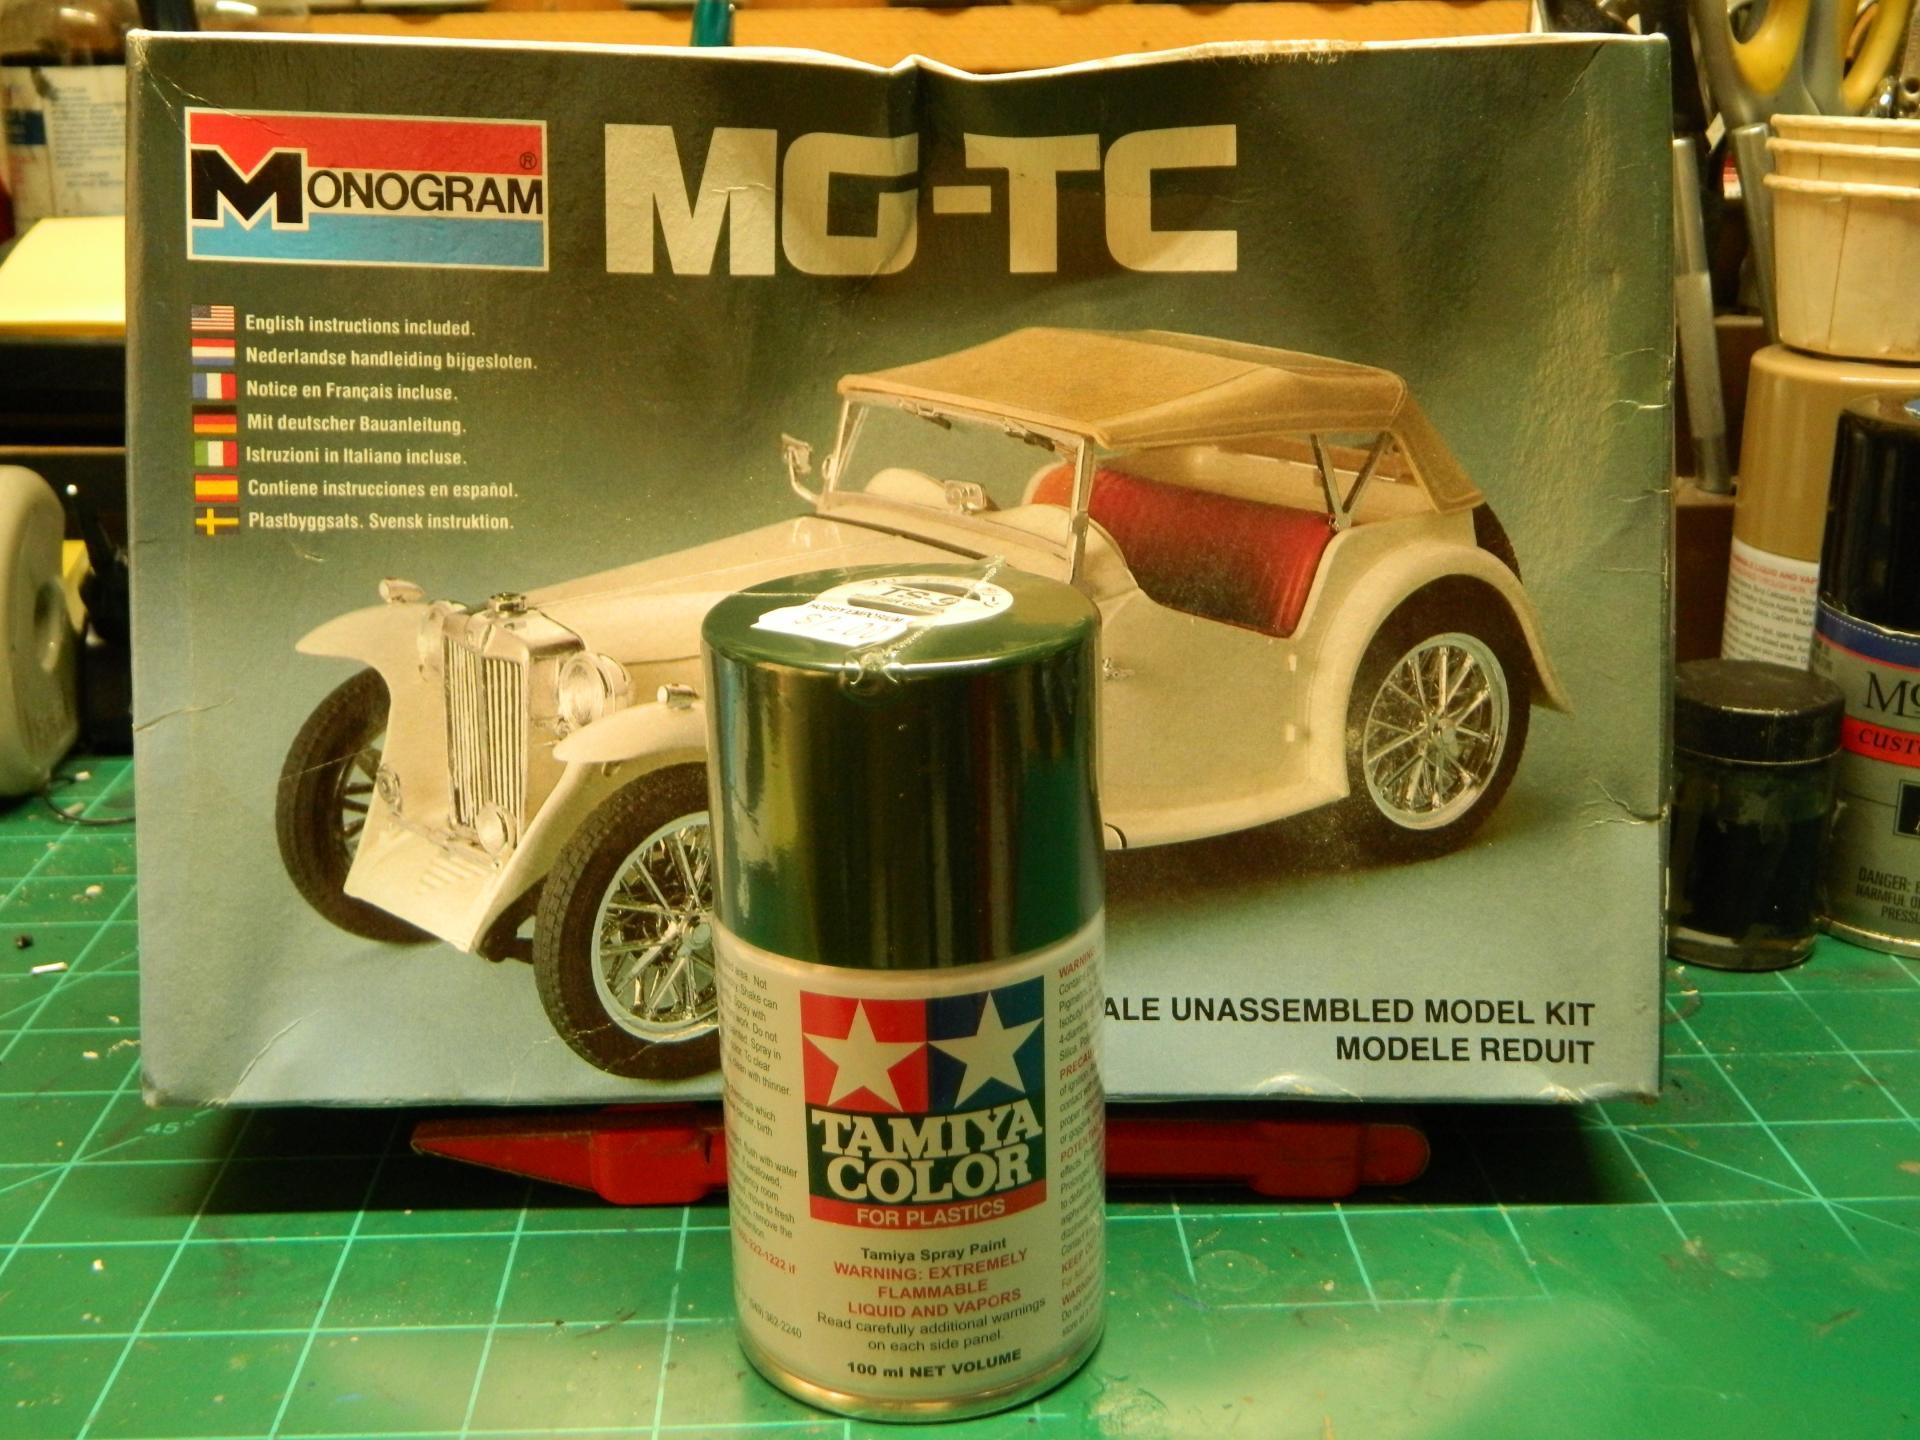 MGTC02.JPG